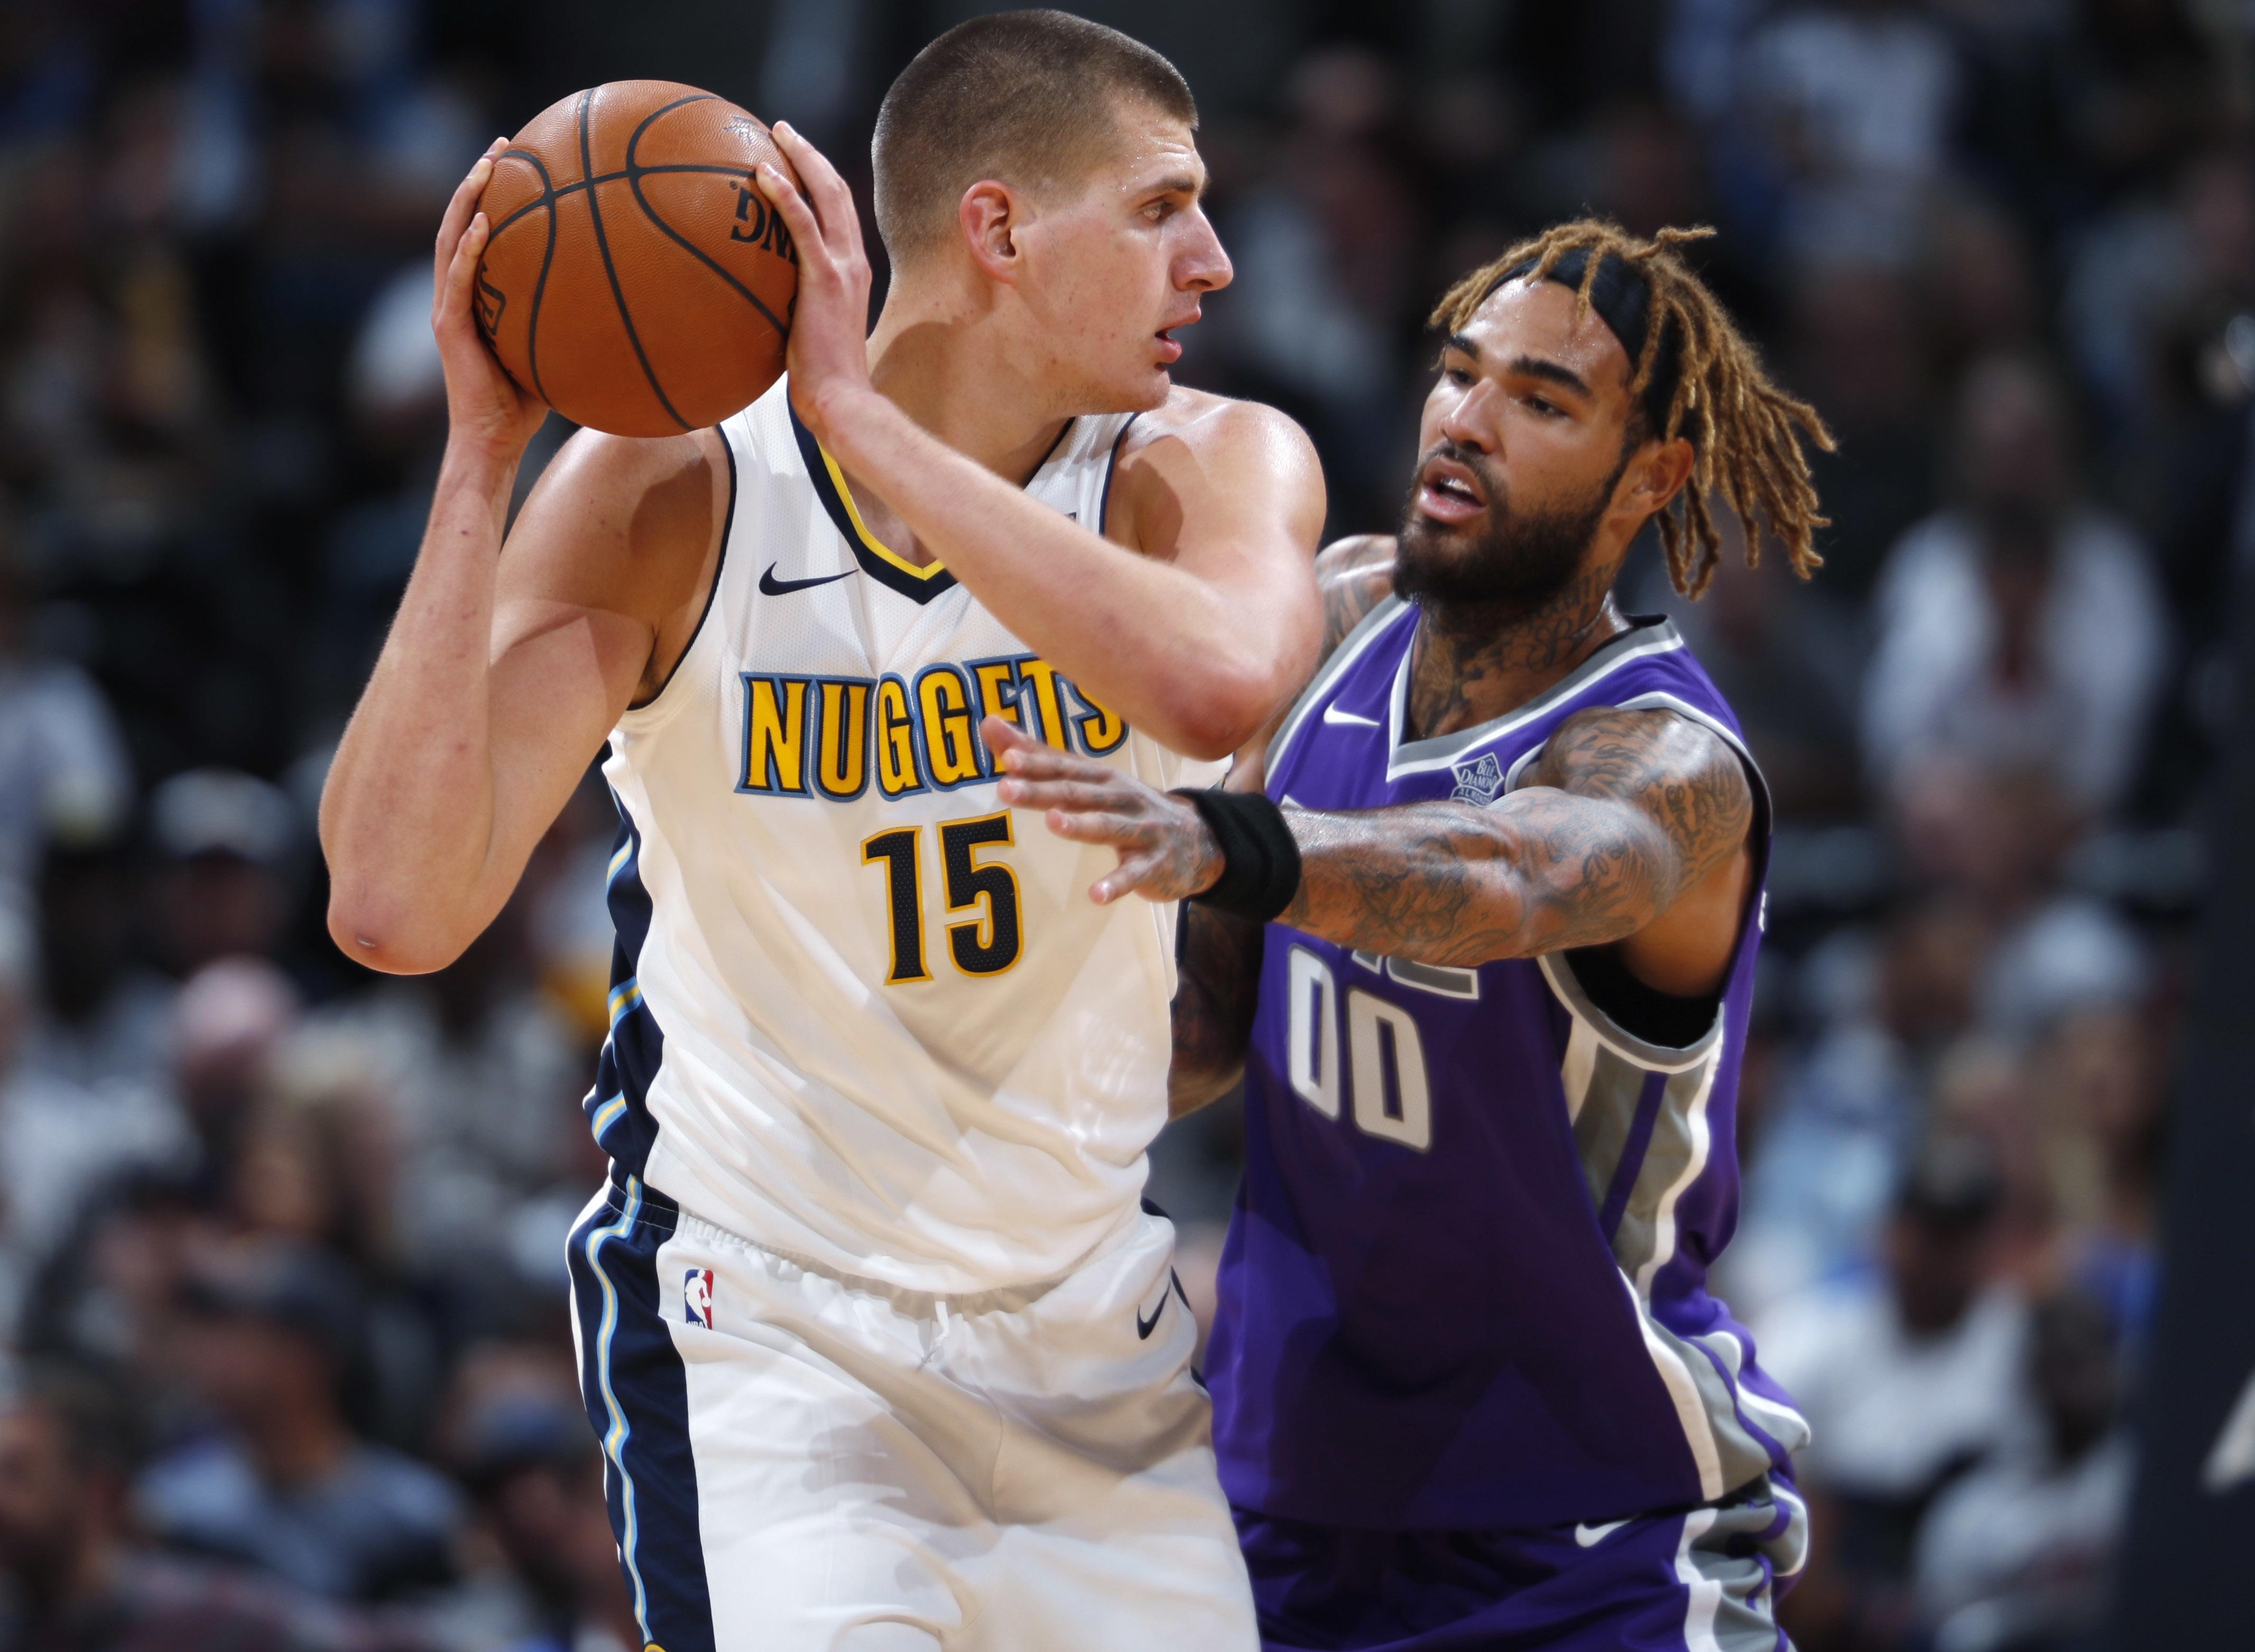 Kings_nuggets_basketball_95318